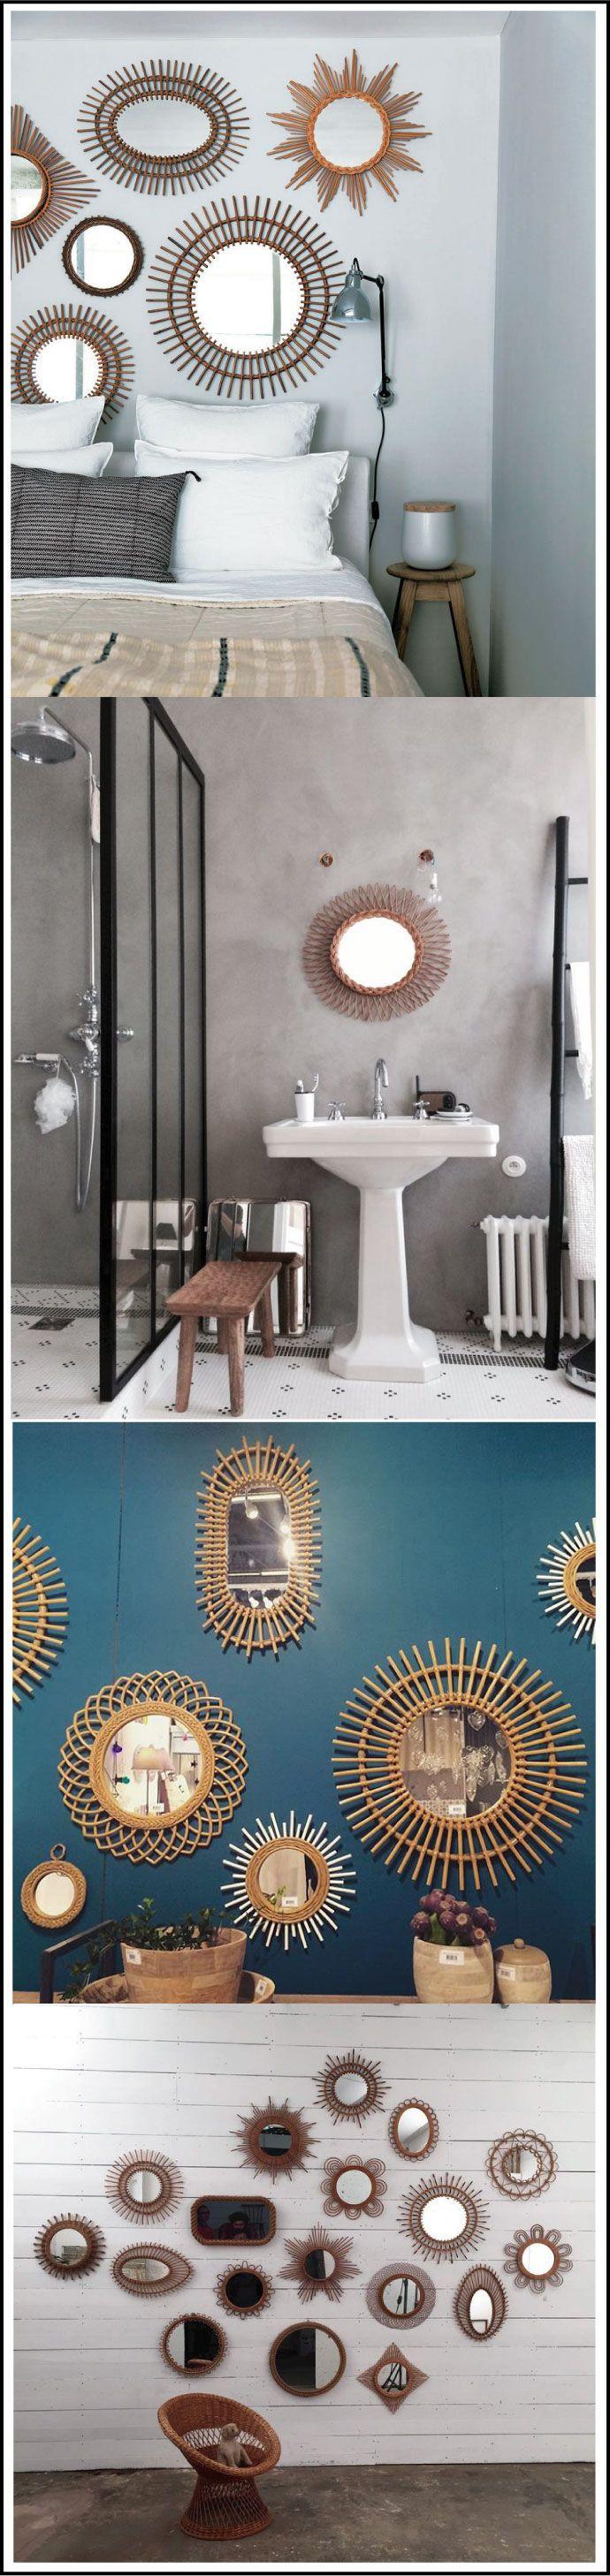 1000 id es propos de meubles en bambou sur pinterest for Meubles en bambou